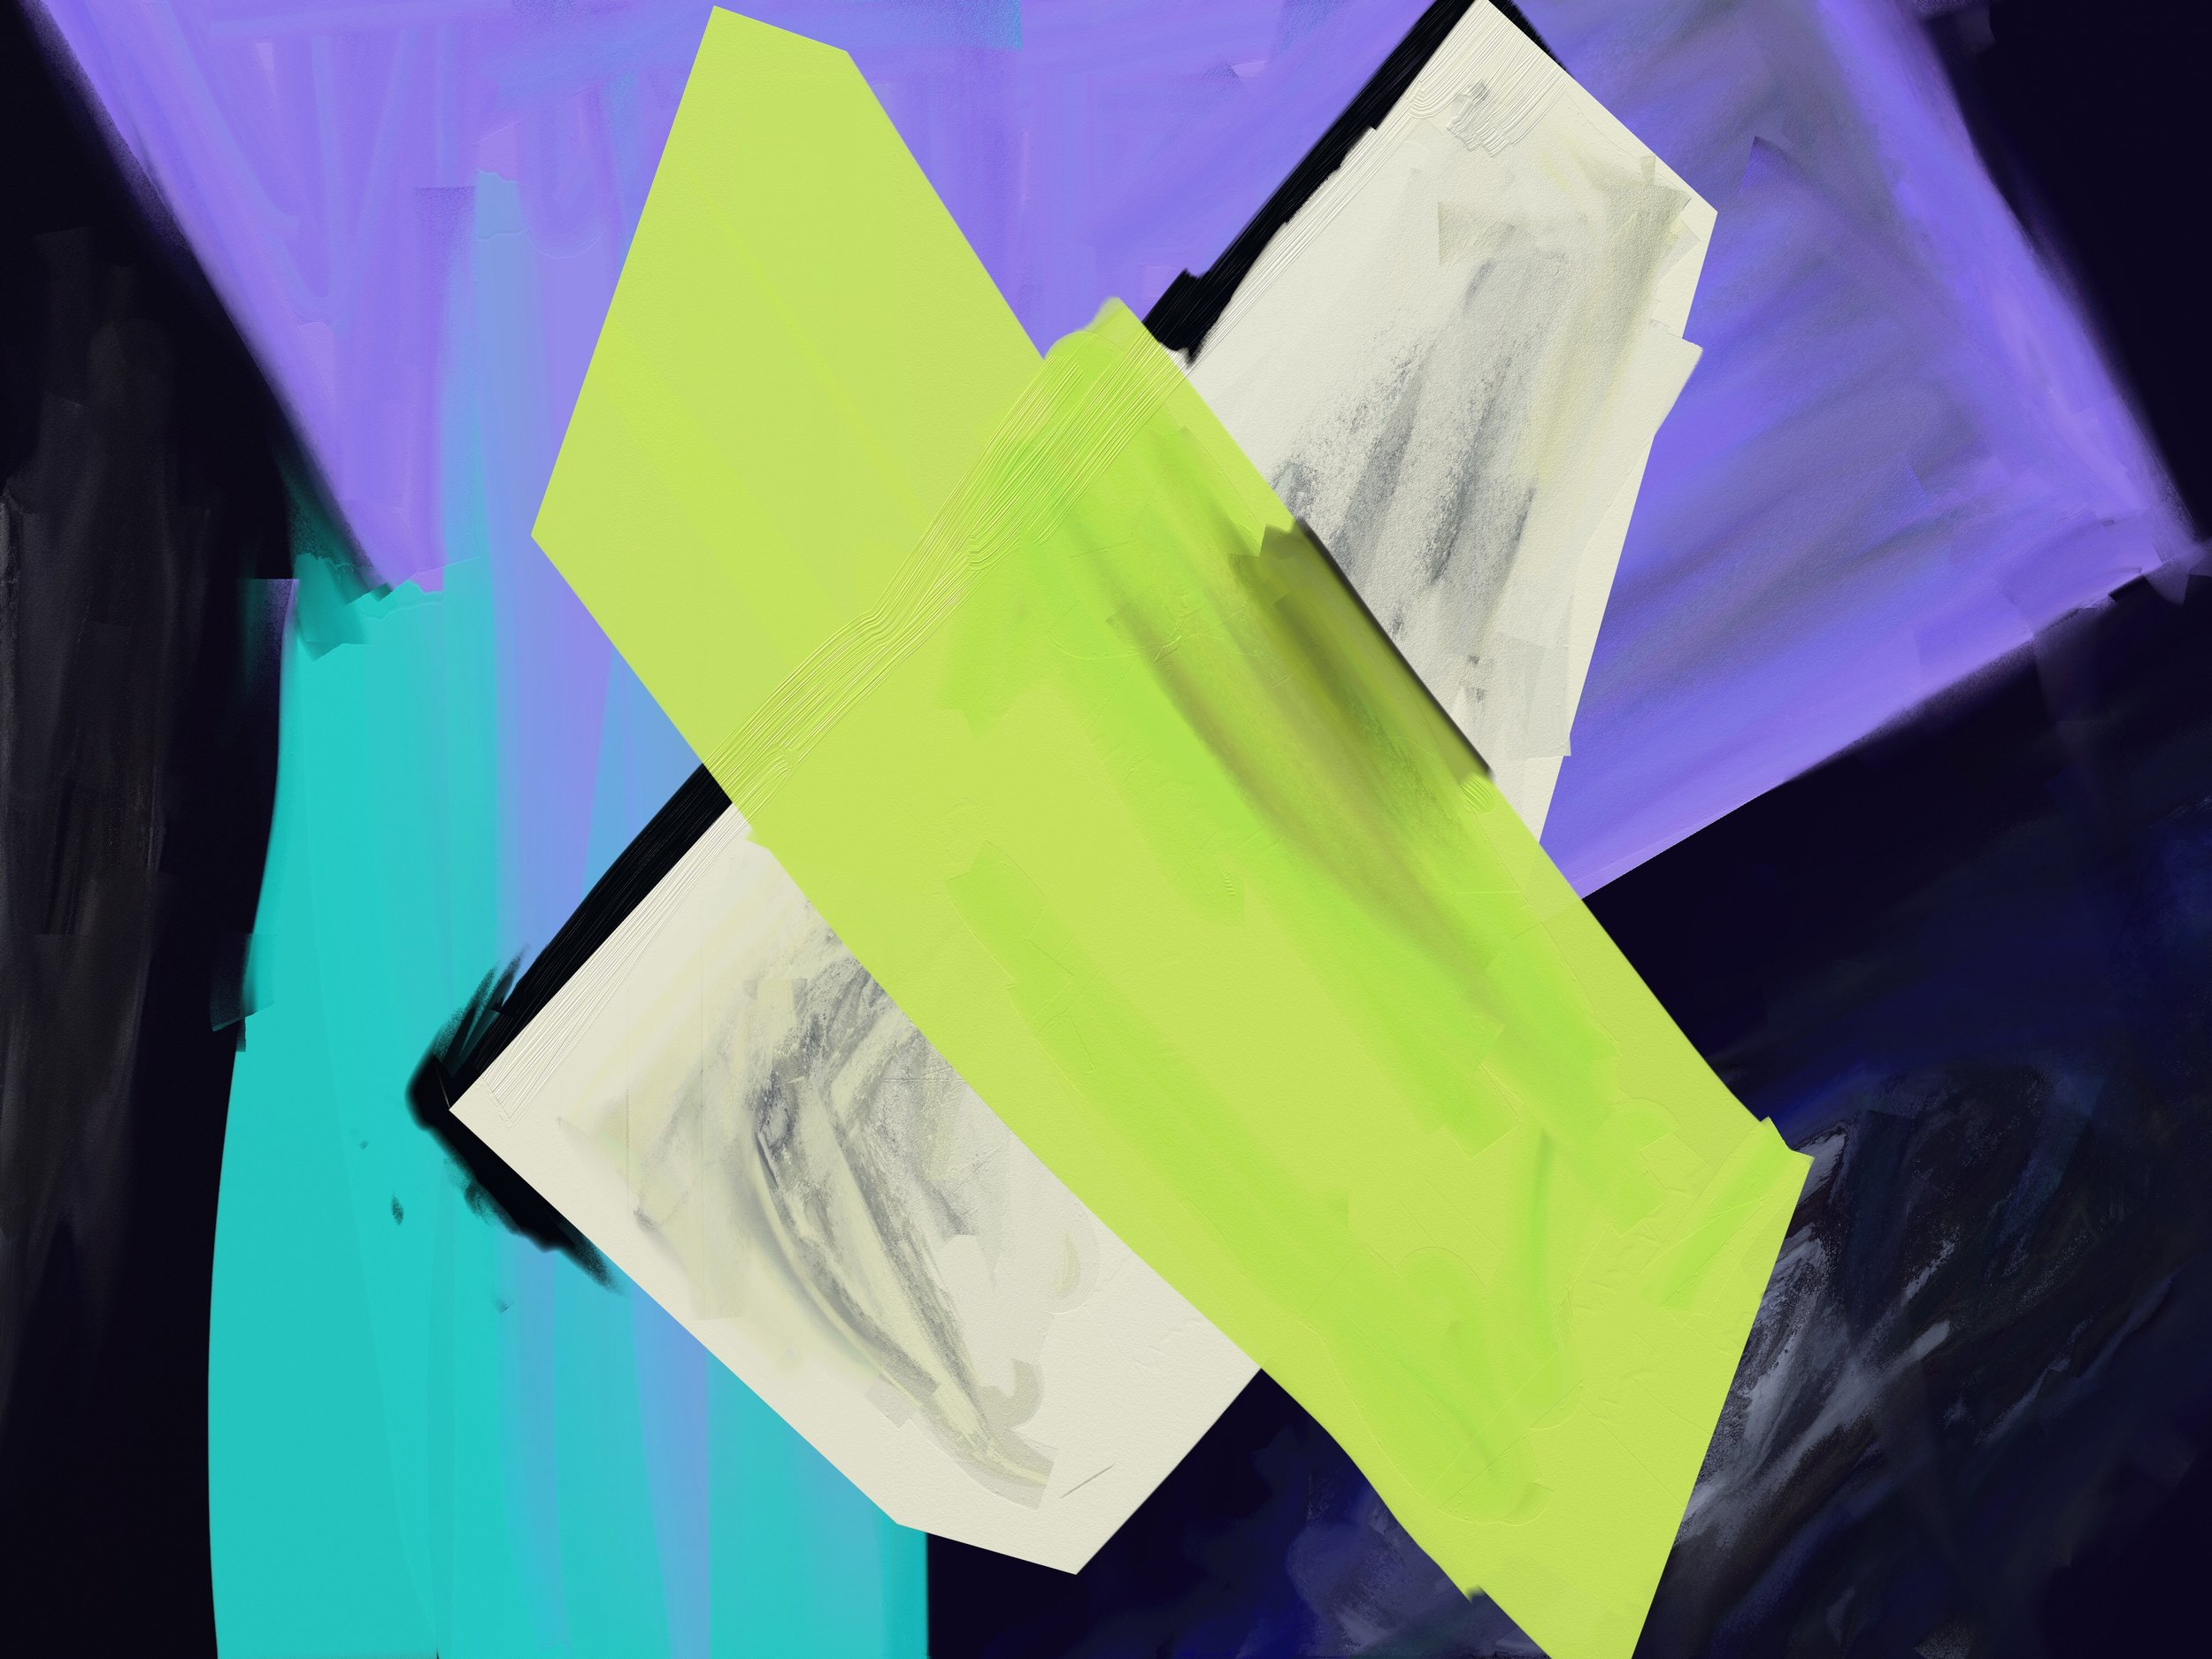 Unhinged (2019) iPad creation